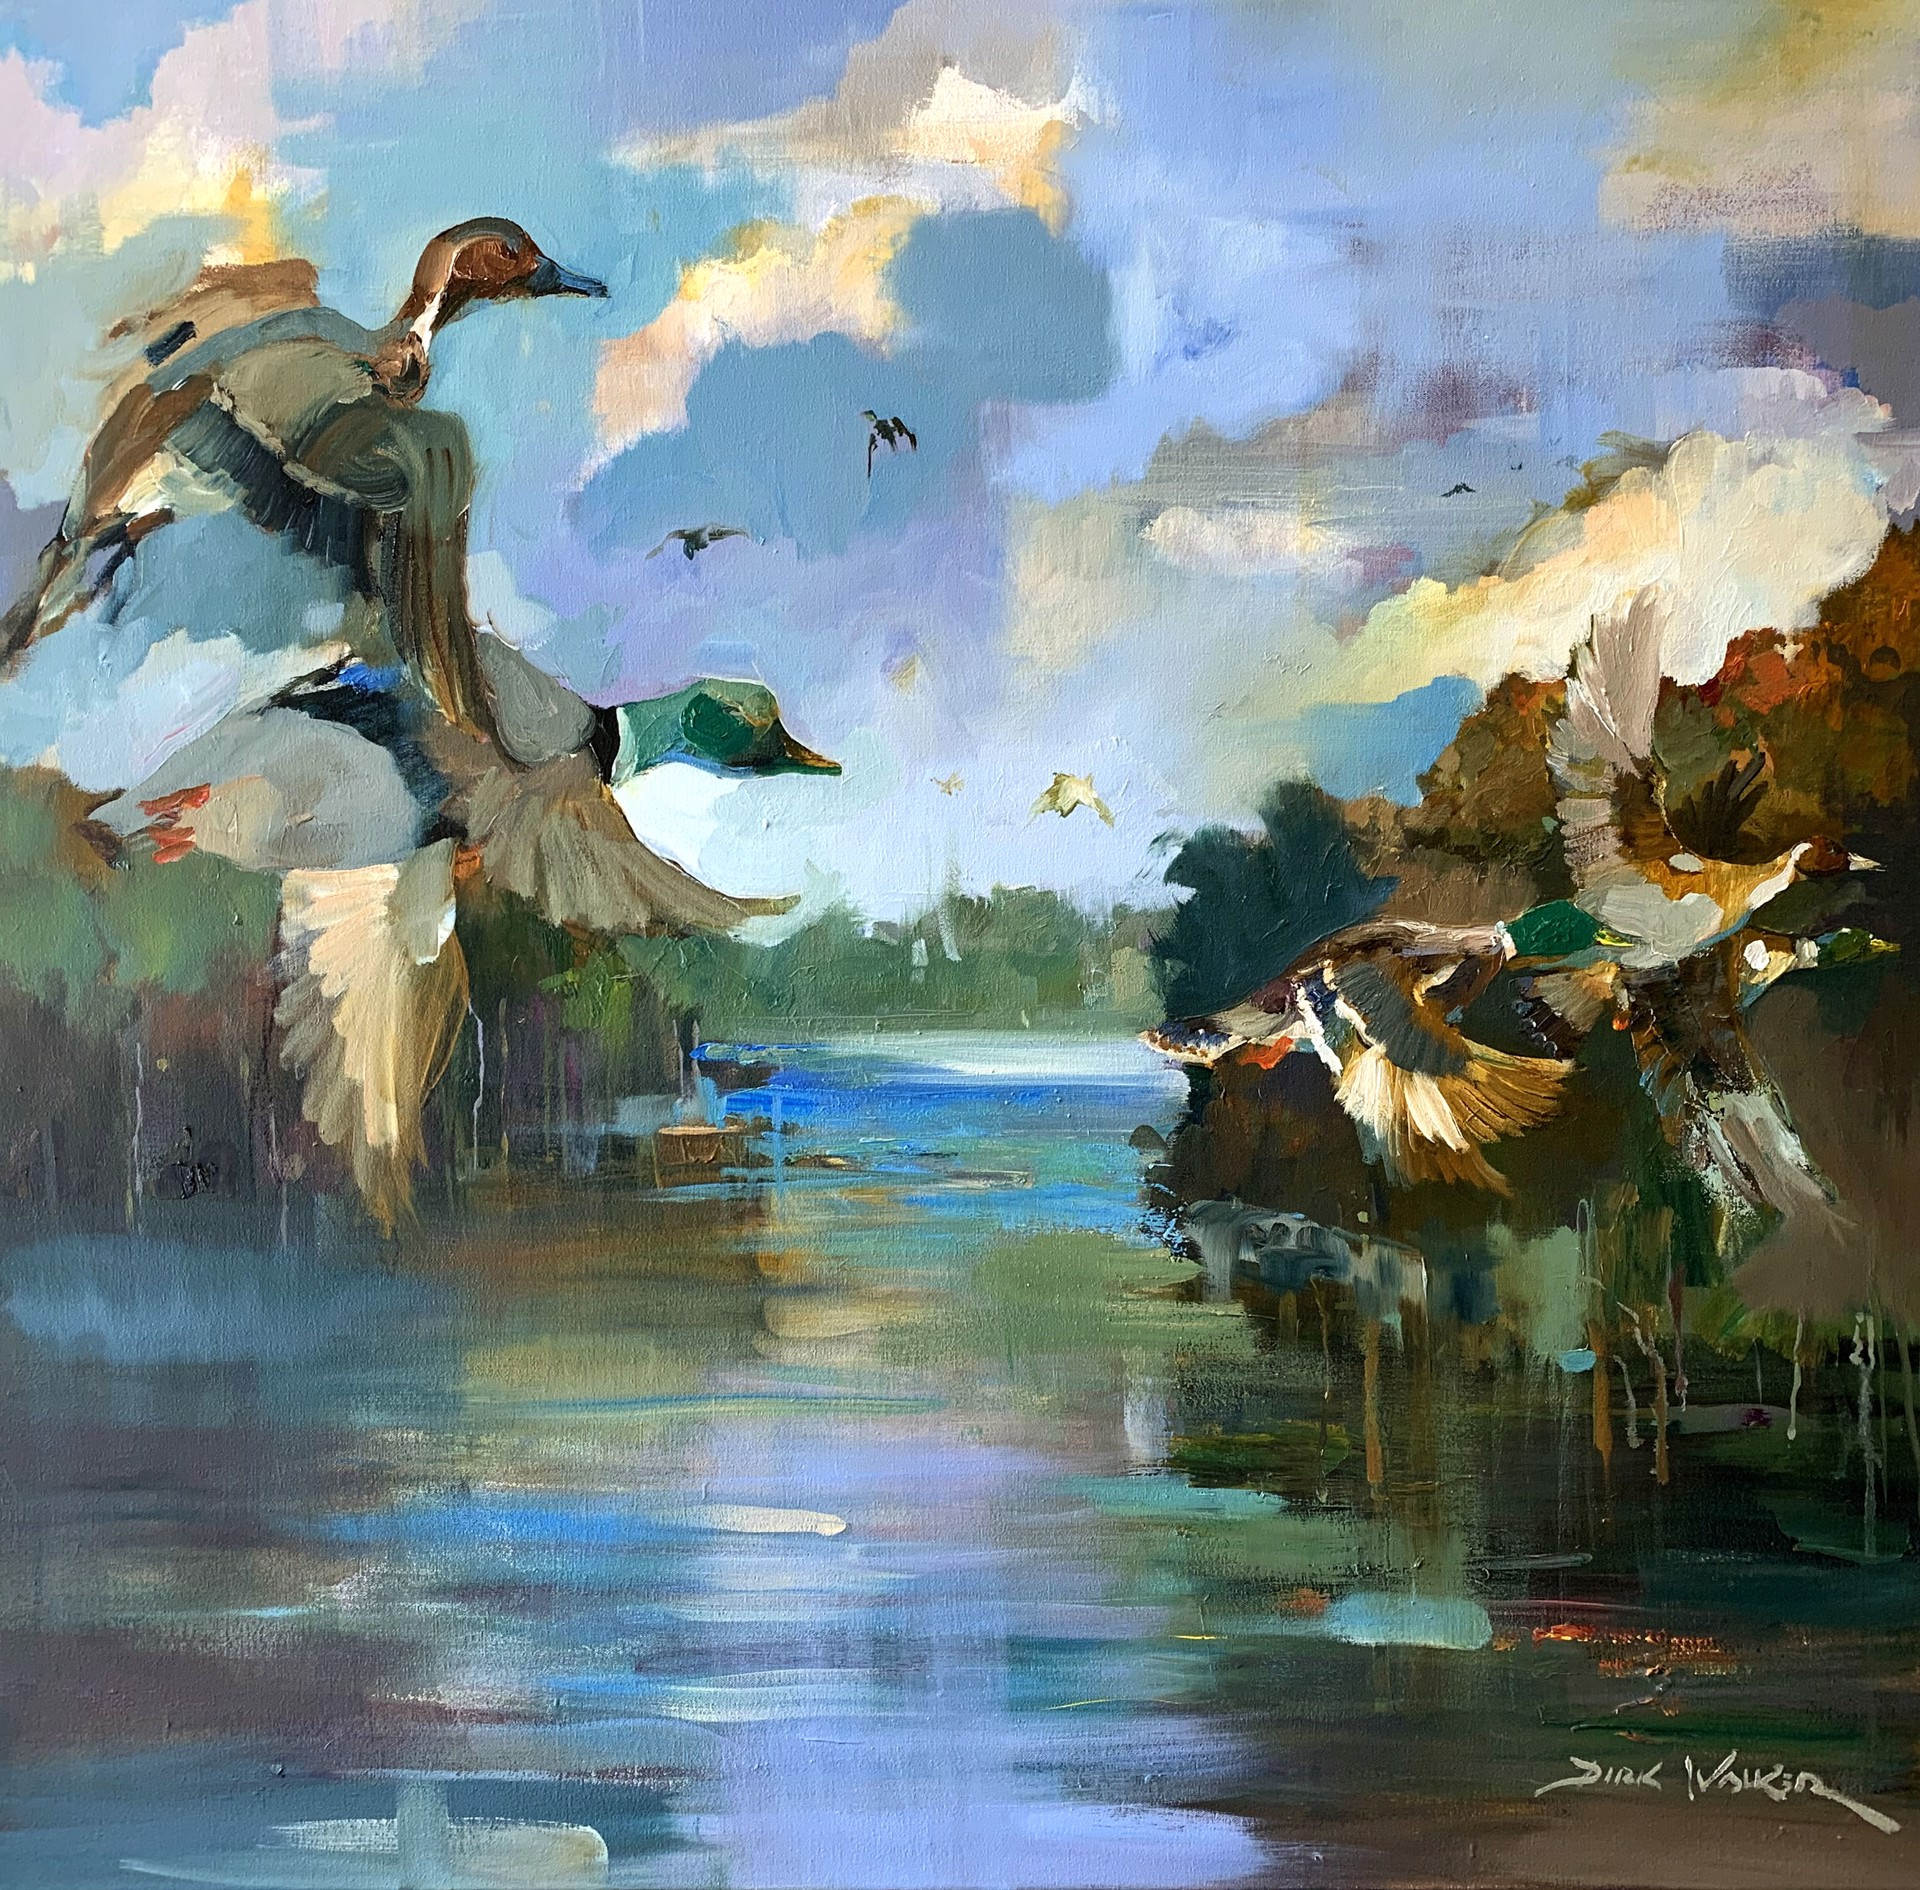 Coosa River Waterfowl by Dirk Walker